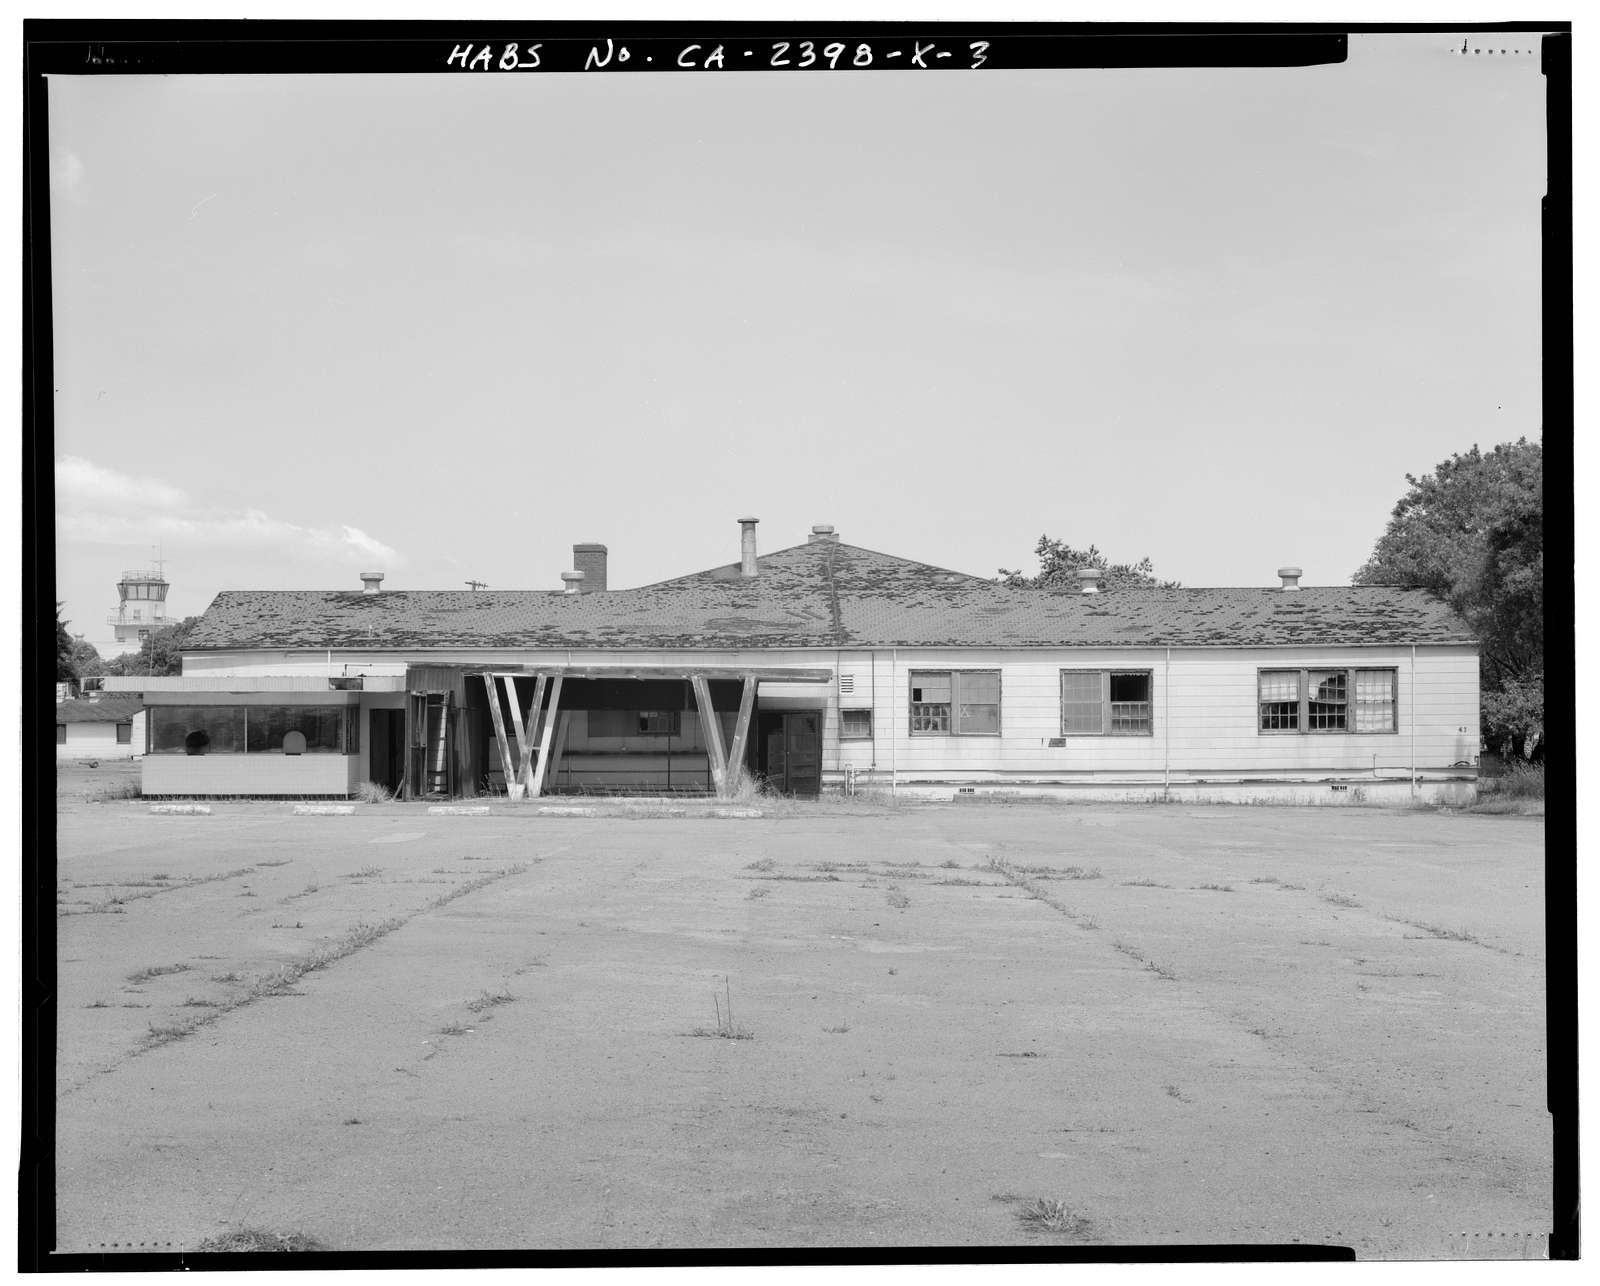 Hamilton Field, Service Club, Sixth Street between Escolta & Hangar Avenues, Novato, Marin County, CA